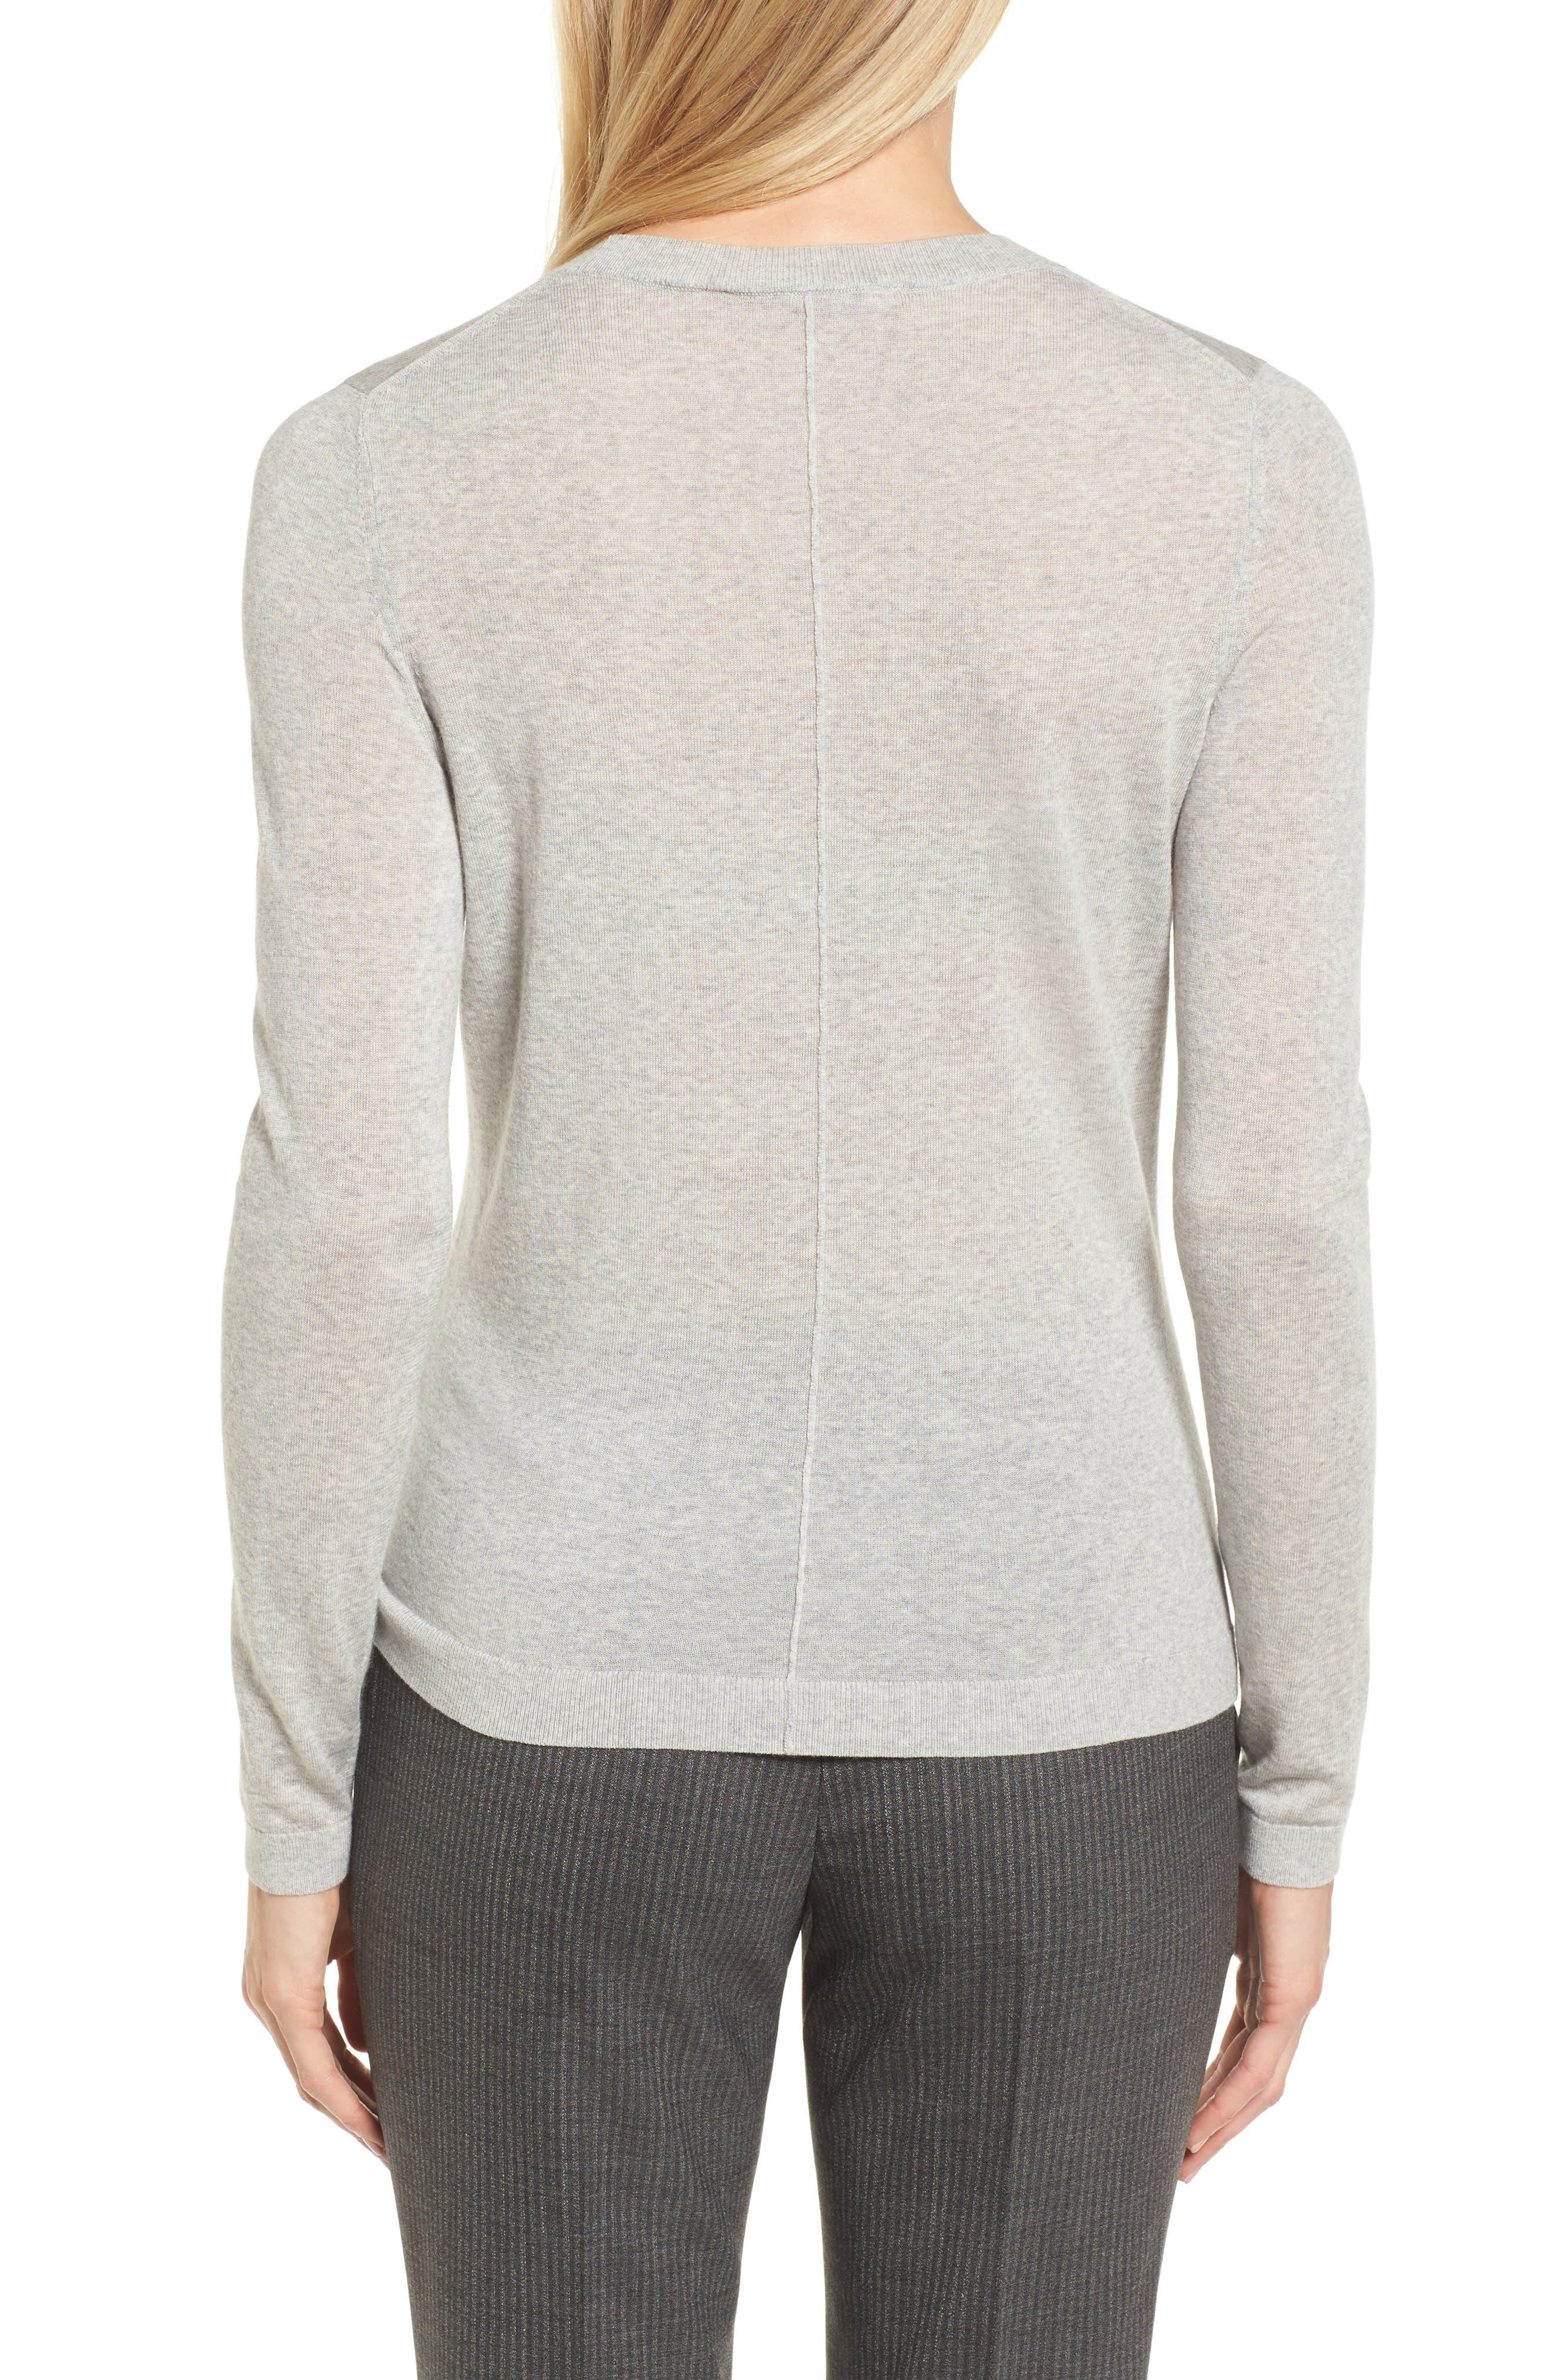 Fayme Wool Crewneck Sweater,                             Alternate thumbnail 2, color,                             Cozy Grey Melange